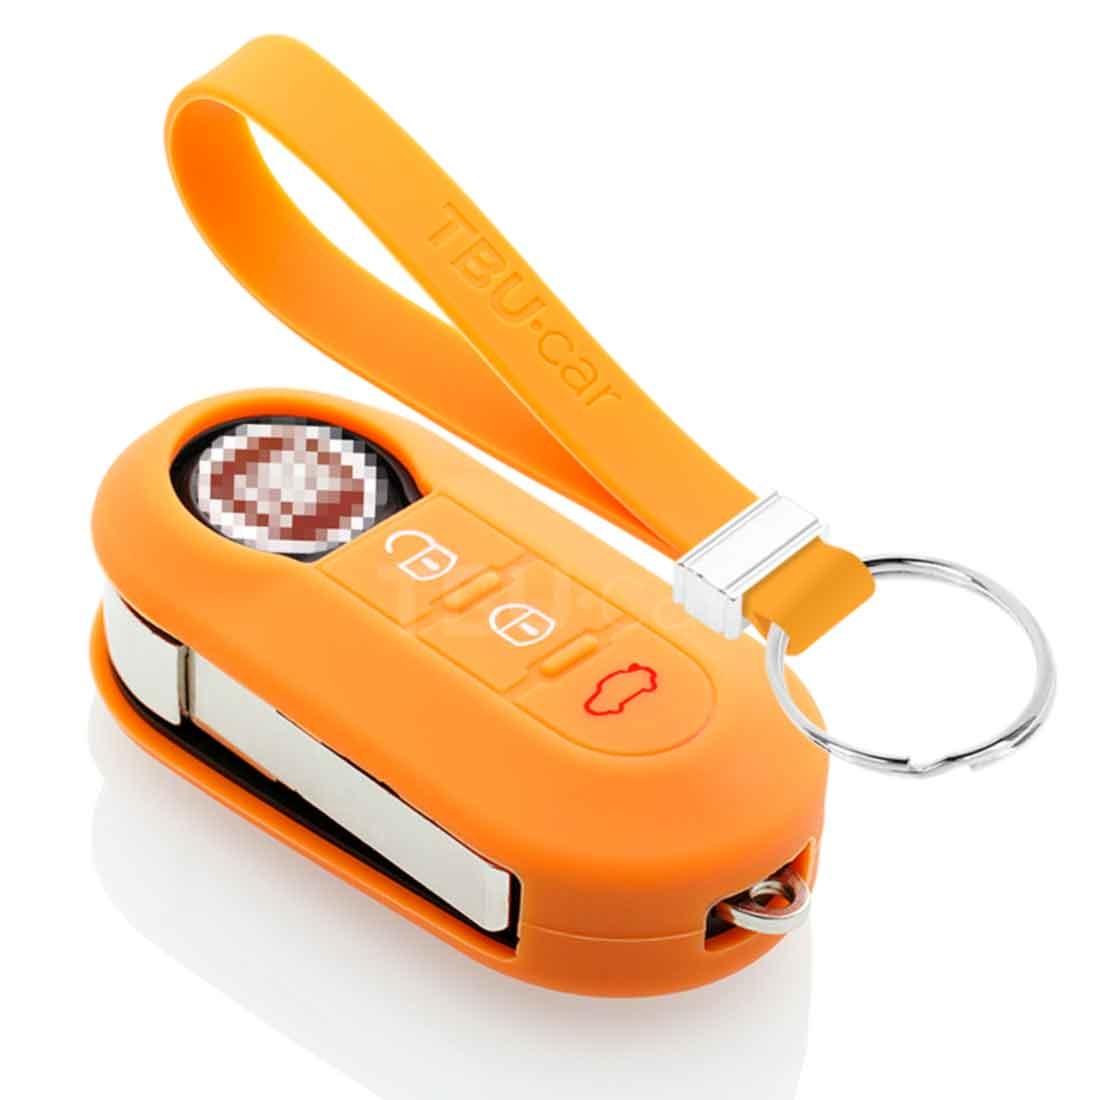 TBU car TBU car Sleutel cover compatibel met Lancia - Silicone sleutelhoesje - beschermhoesje autosleutel - Oranje